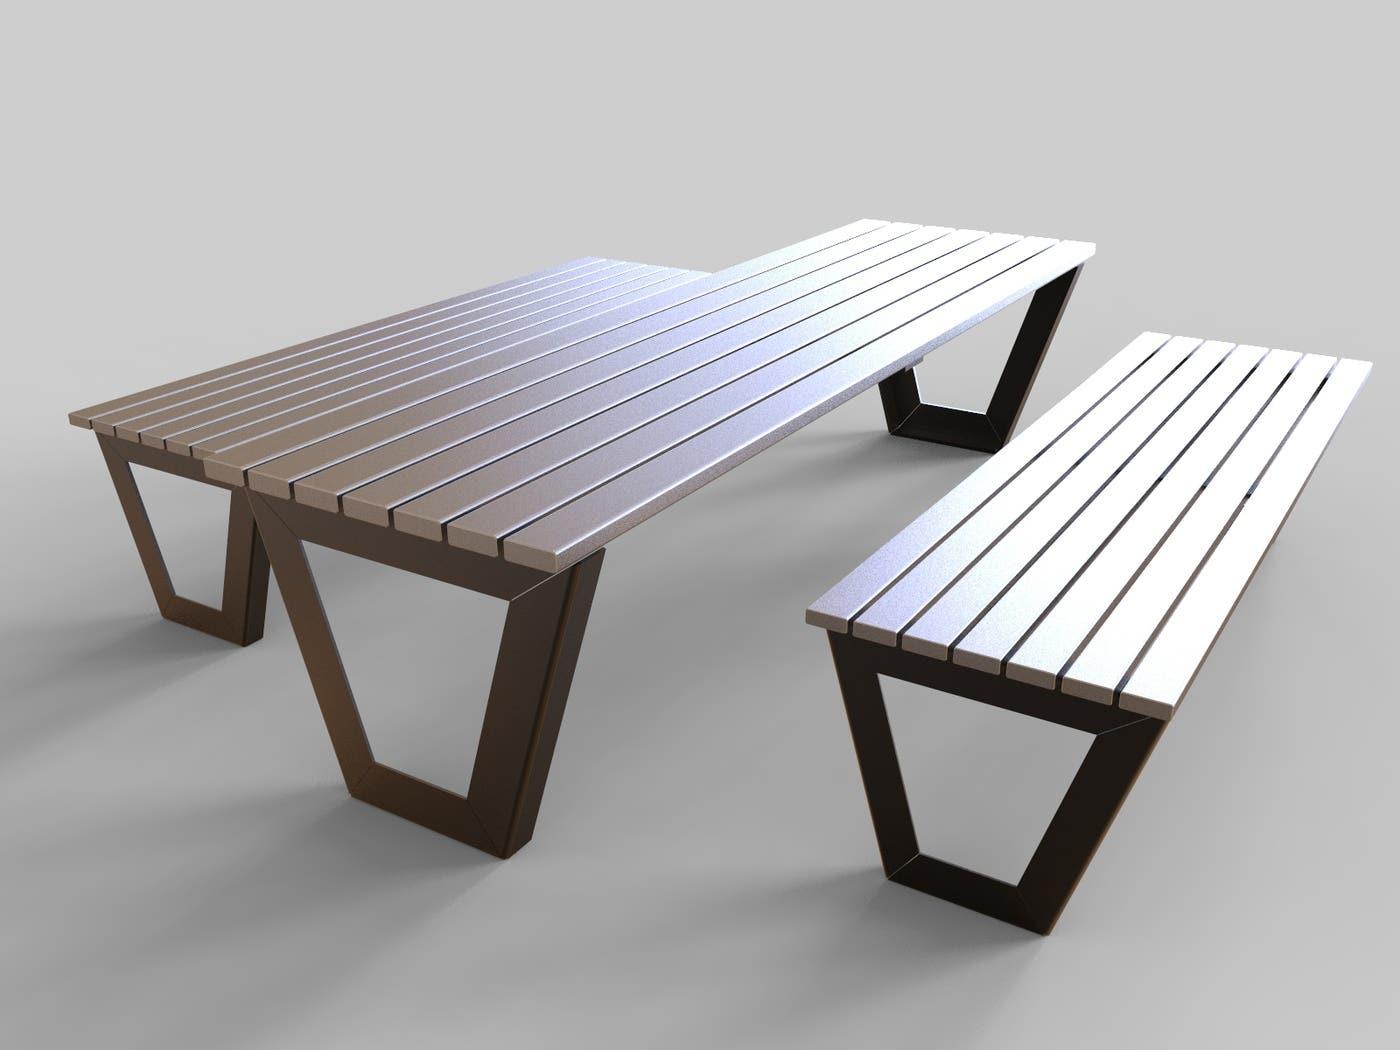 1719818-bench-seats.jpg